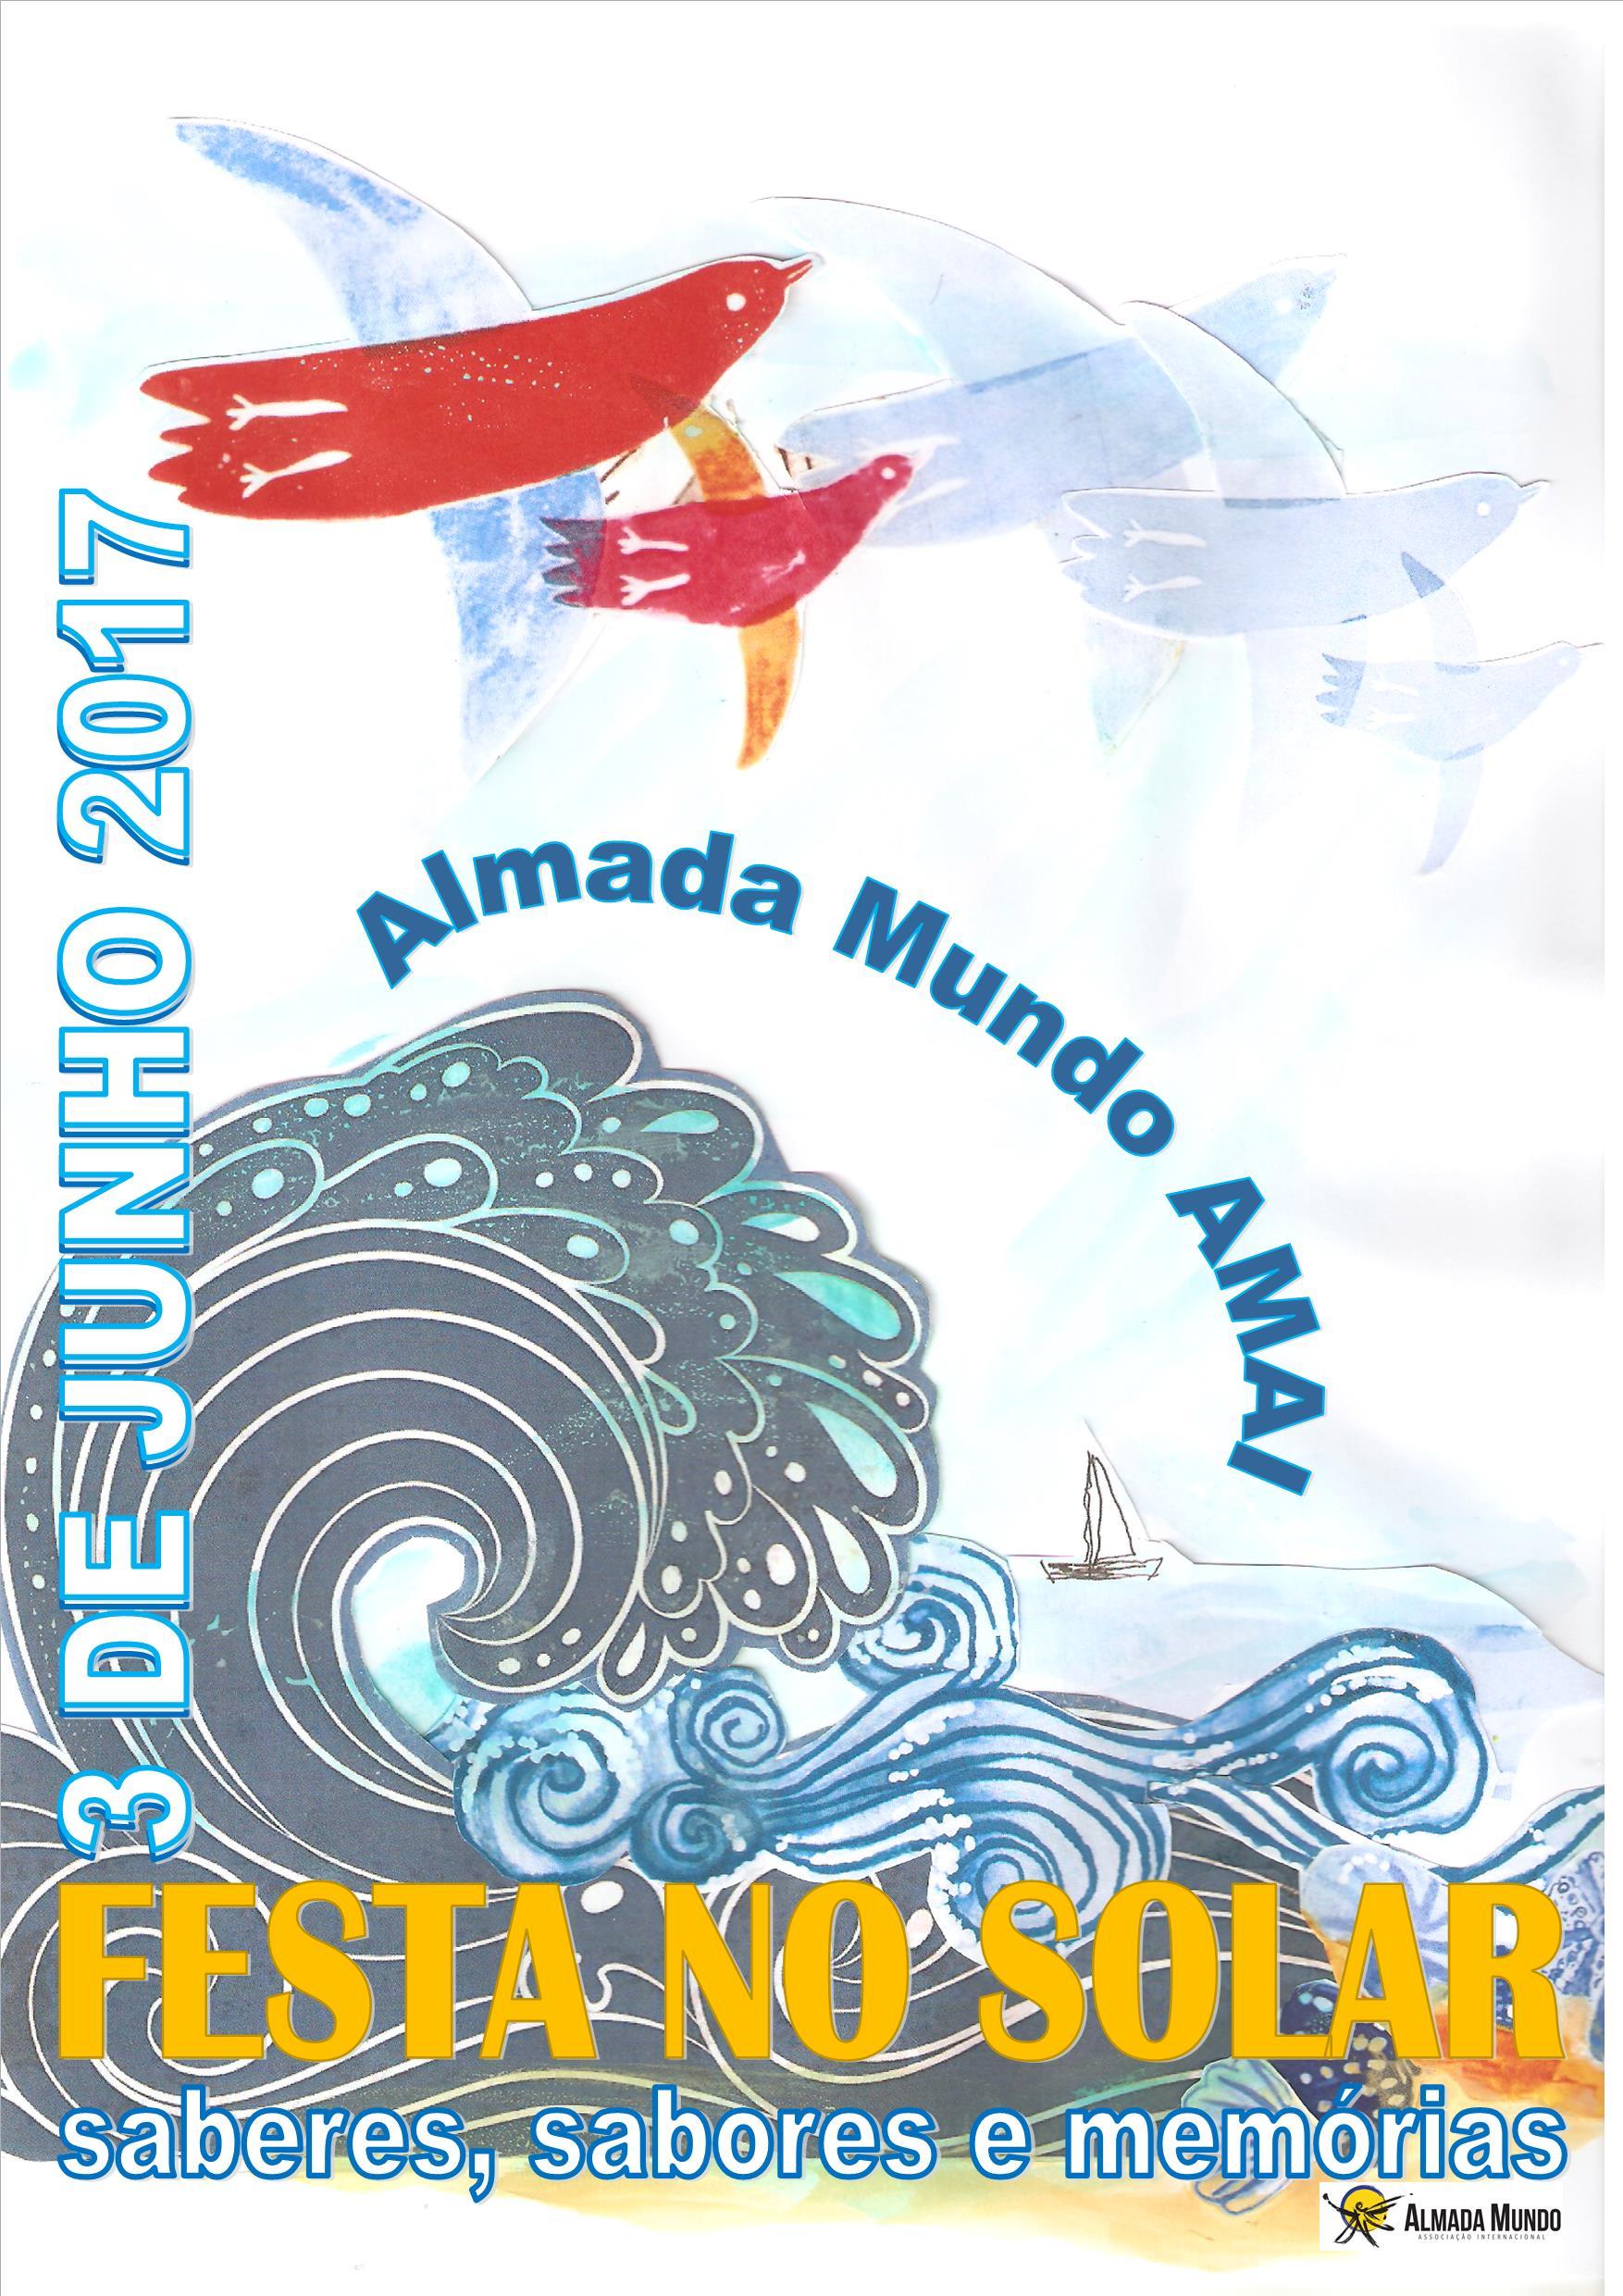 almadamundo4